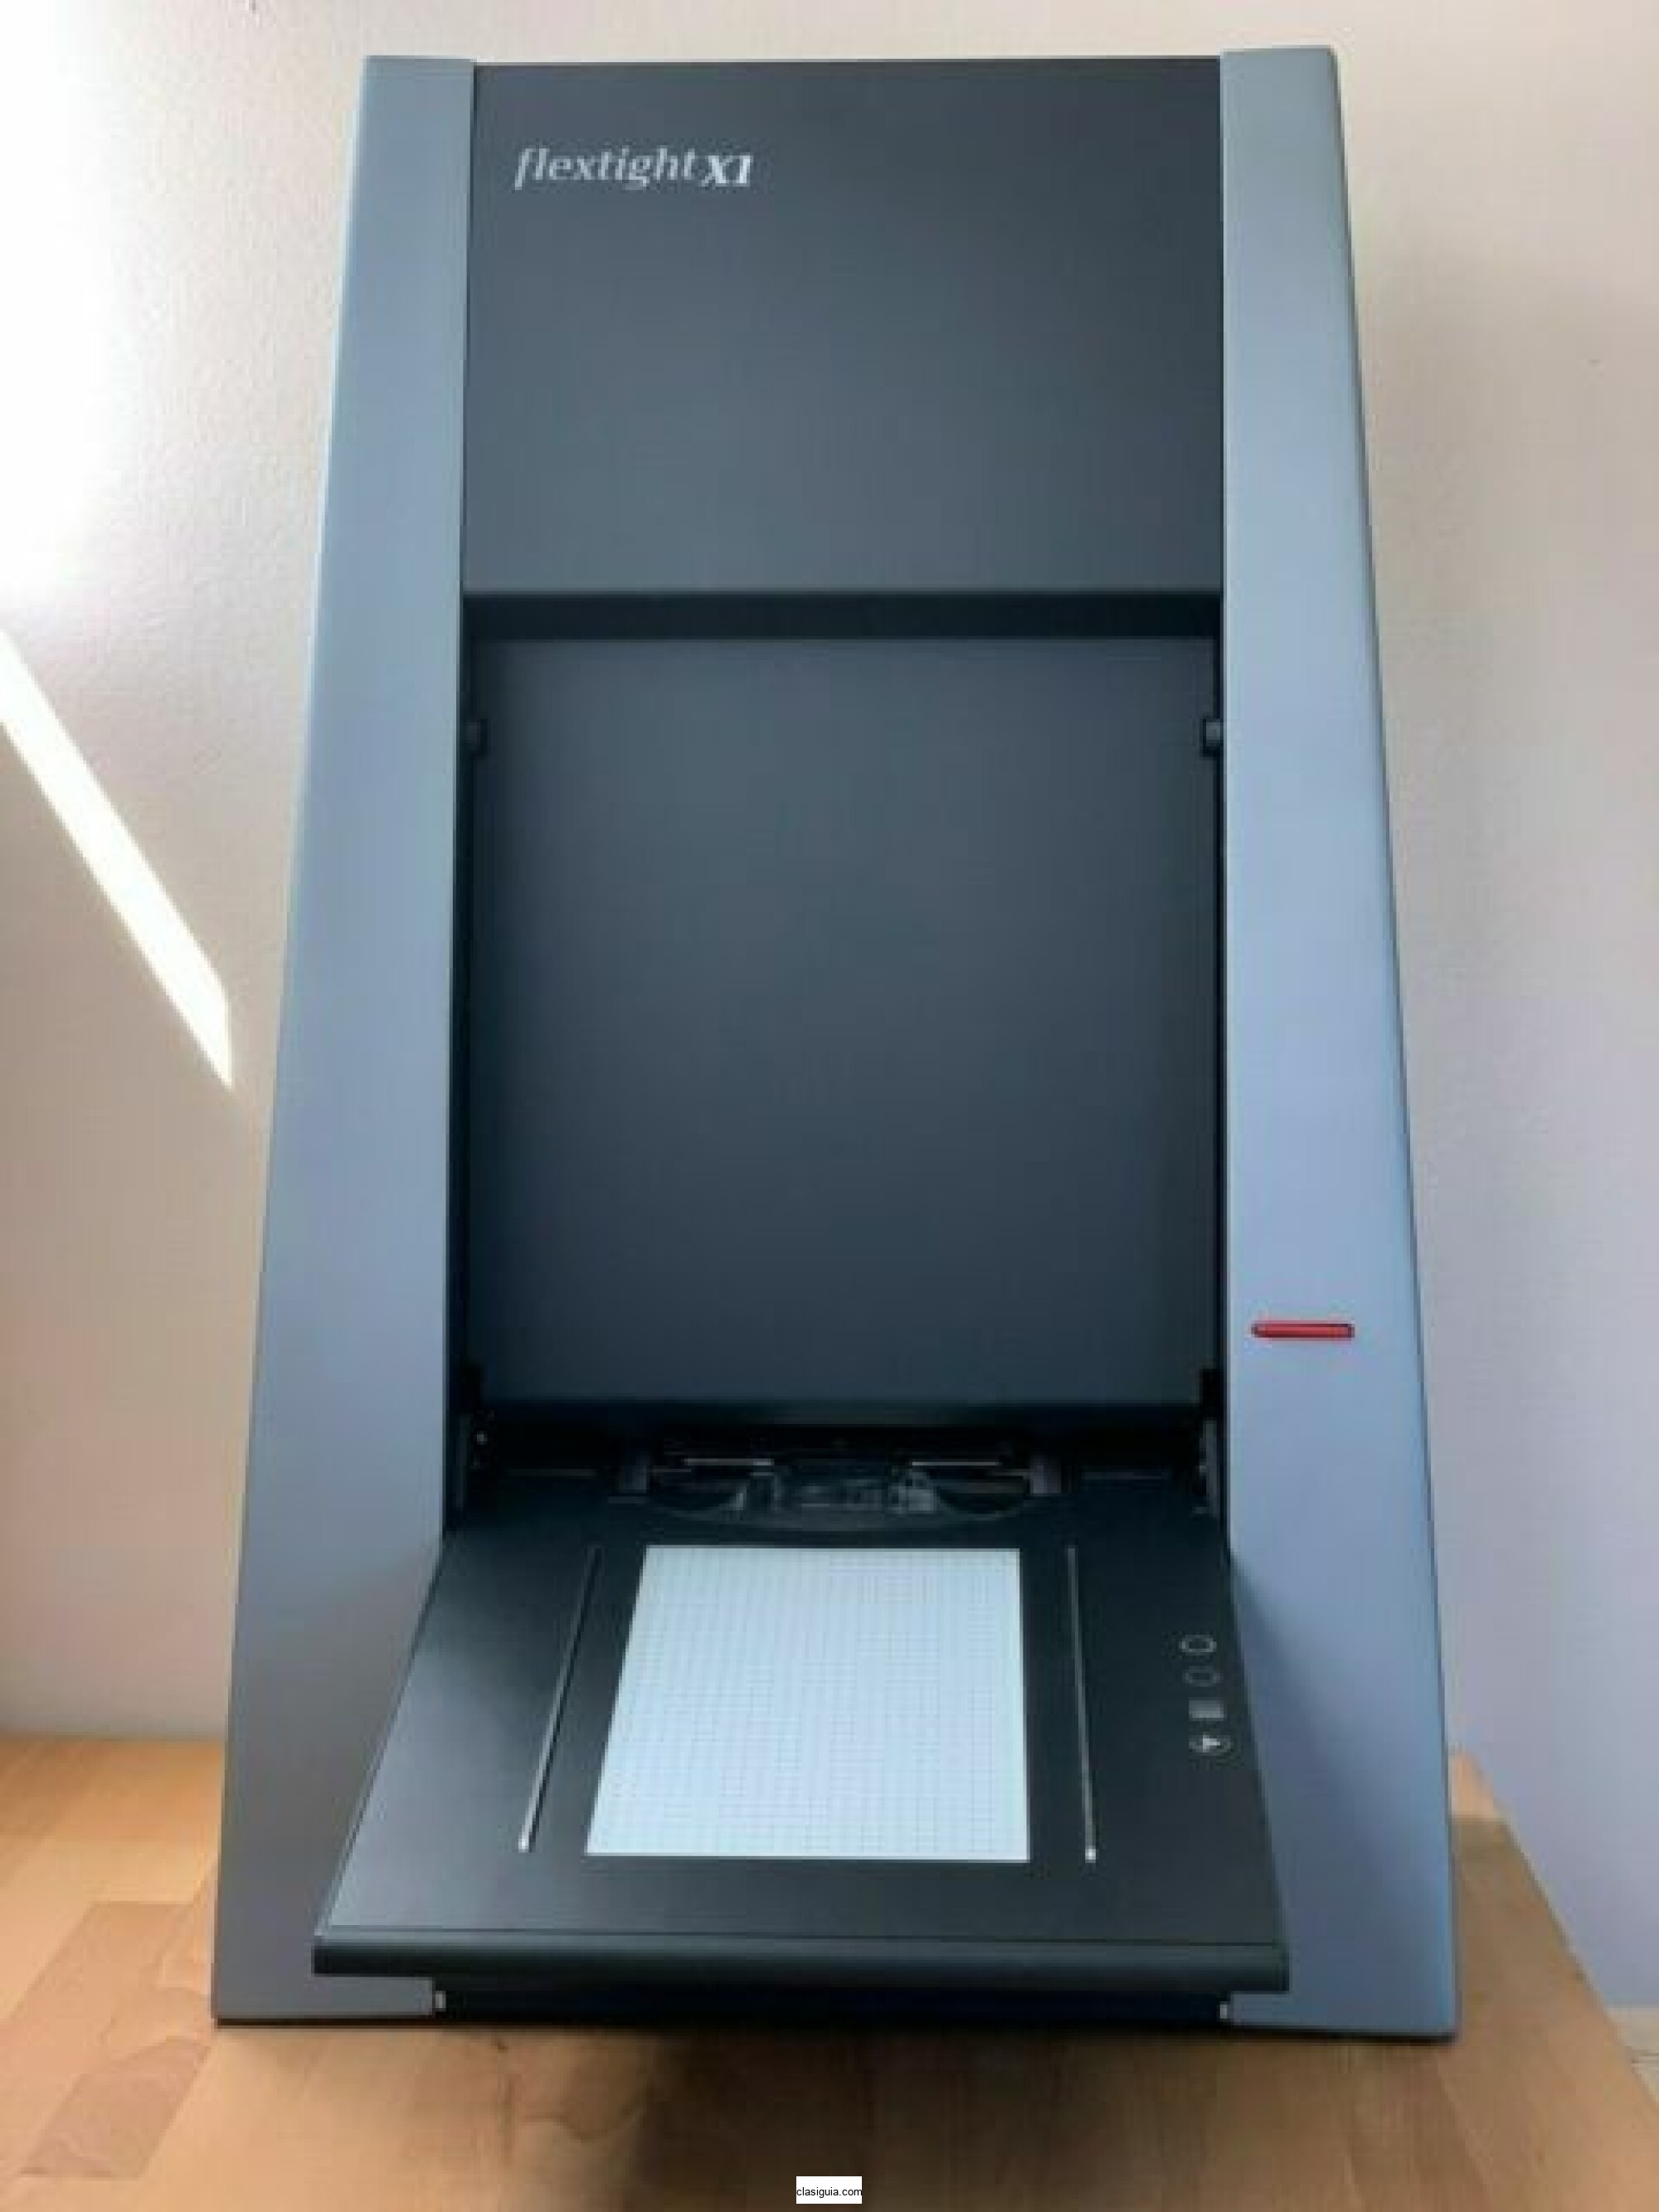 New Hasselblad Flextight X1 Scanner